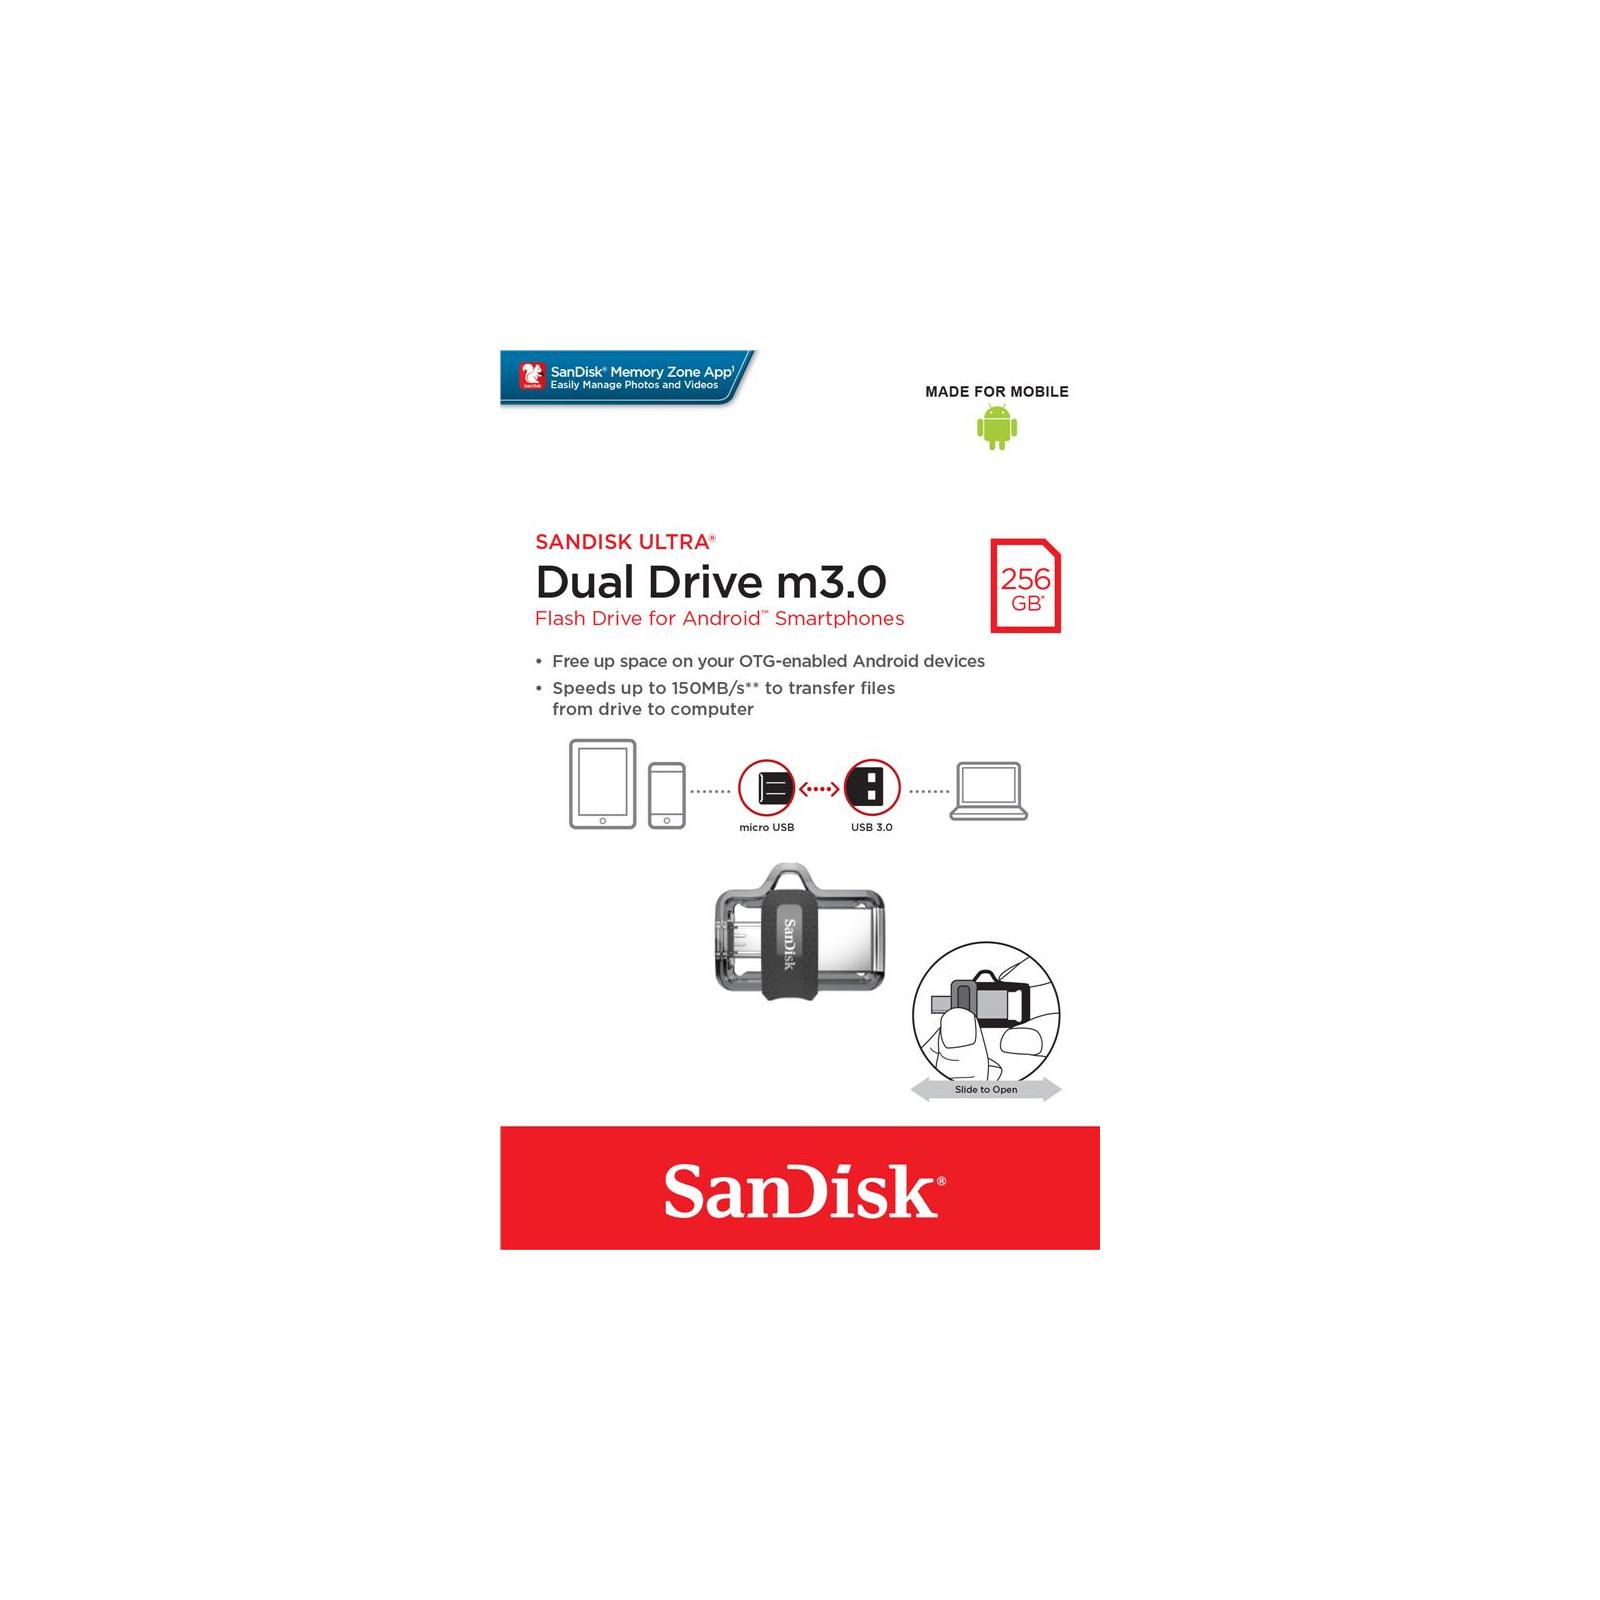 USB флеш накопитель SanDisk 128GB Ultra Dual Drive M3.0 USB 3.0 (SDDD3-128G-G46) изображение 7